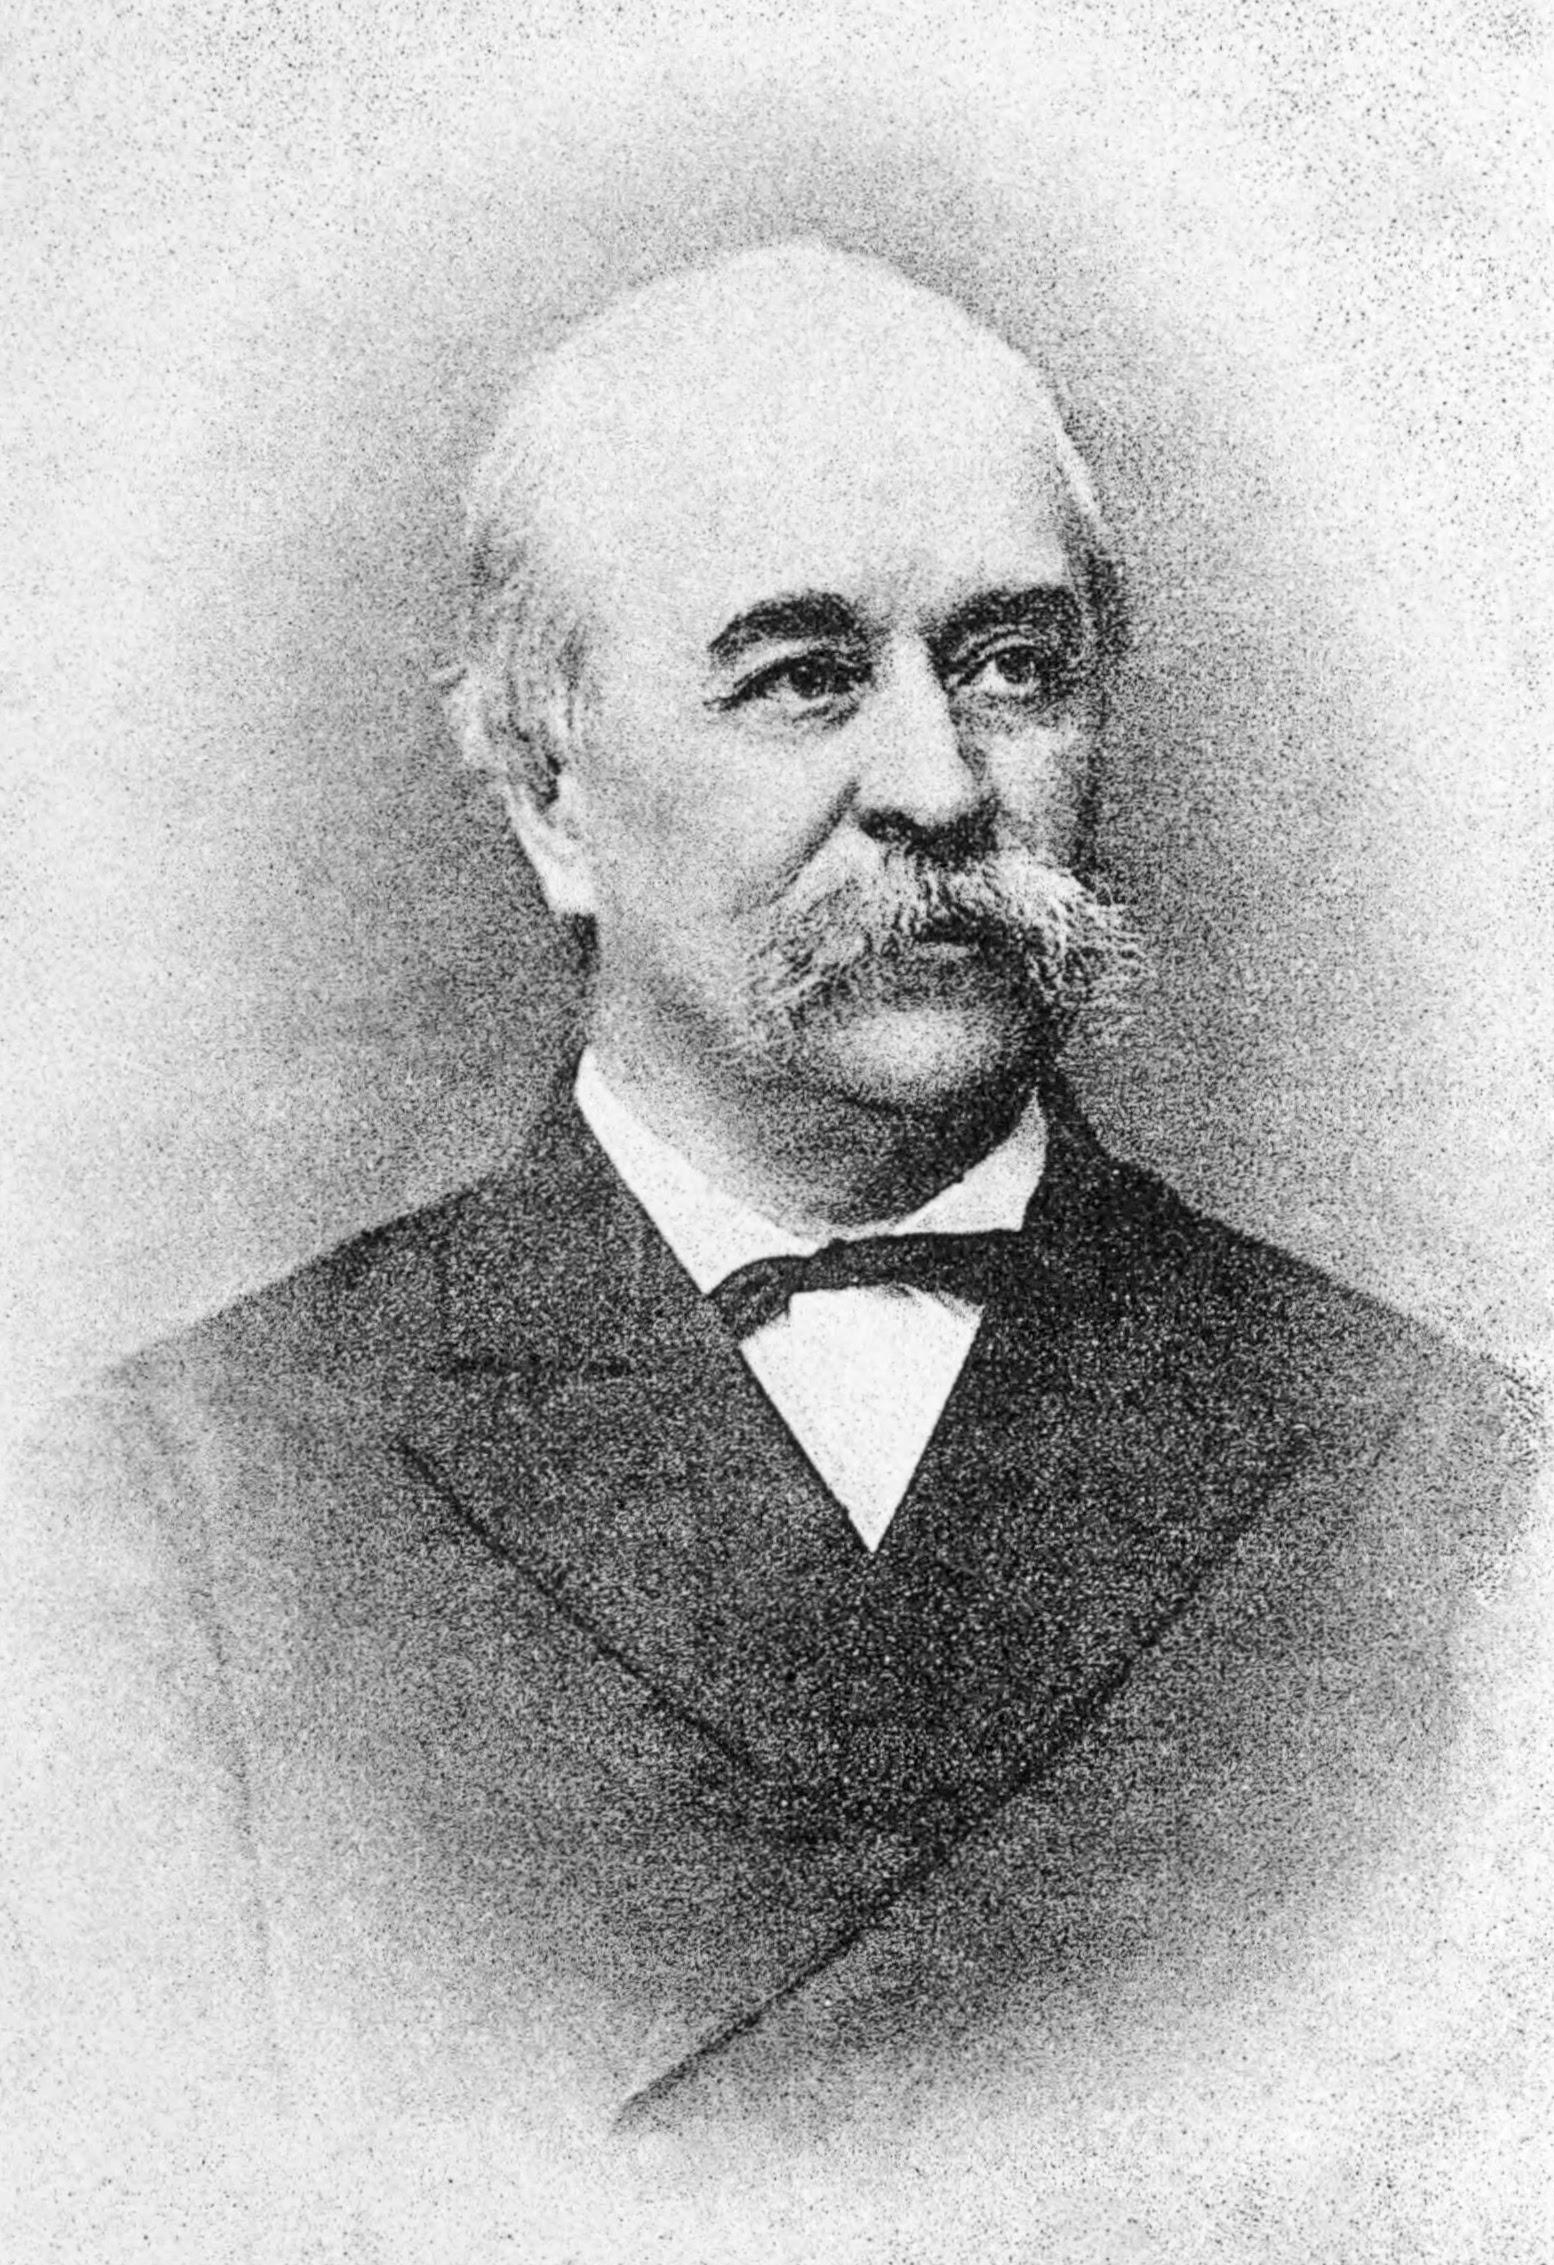 http://upload.wikimedia.org/wikipedia/commons/c/c4/Grigory_Petrovich_Danilevsky.jpg